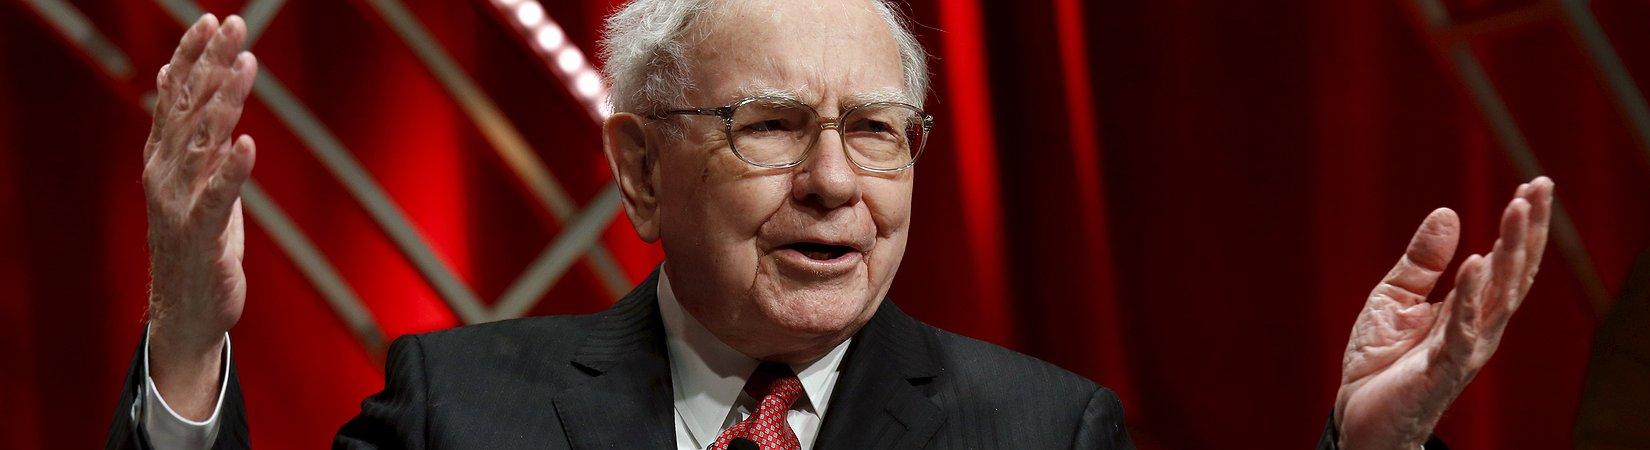 5 hechos sorprendentes sobre Warren Buffett